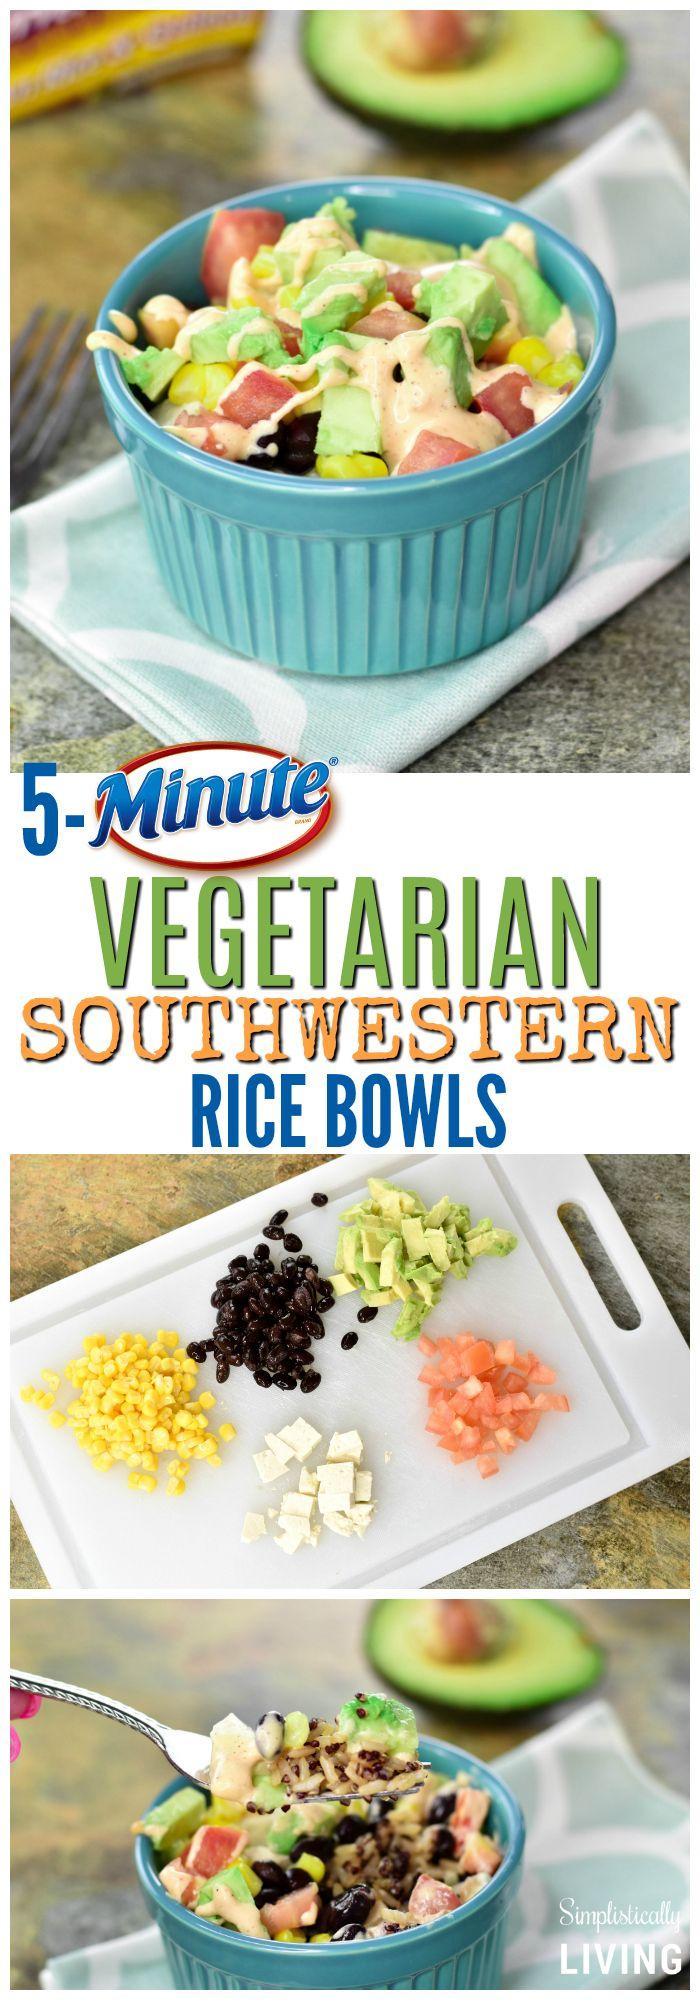 5-Minute Vegetarian Southwestern Rice Bowls AD http://www.simplisticallyliving.com/5-minute-vegetar…stern-rice-bowls/